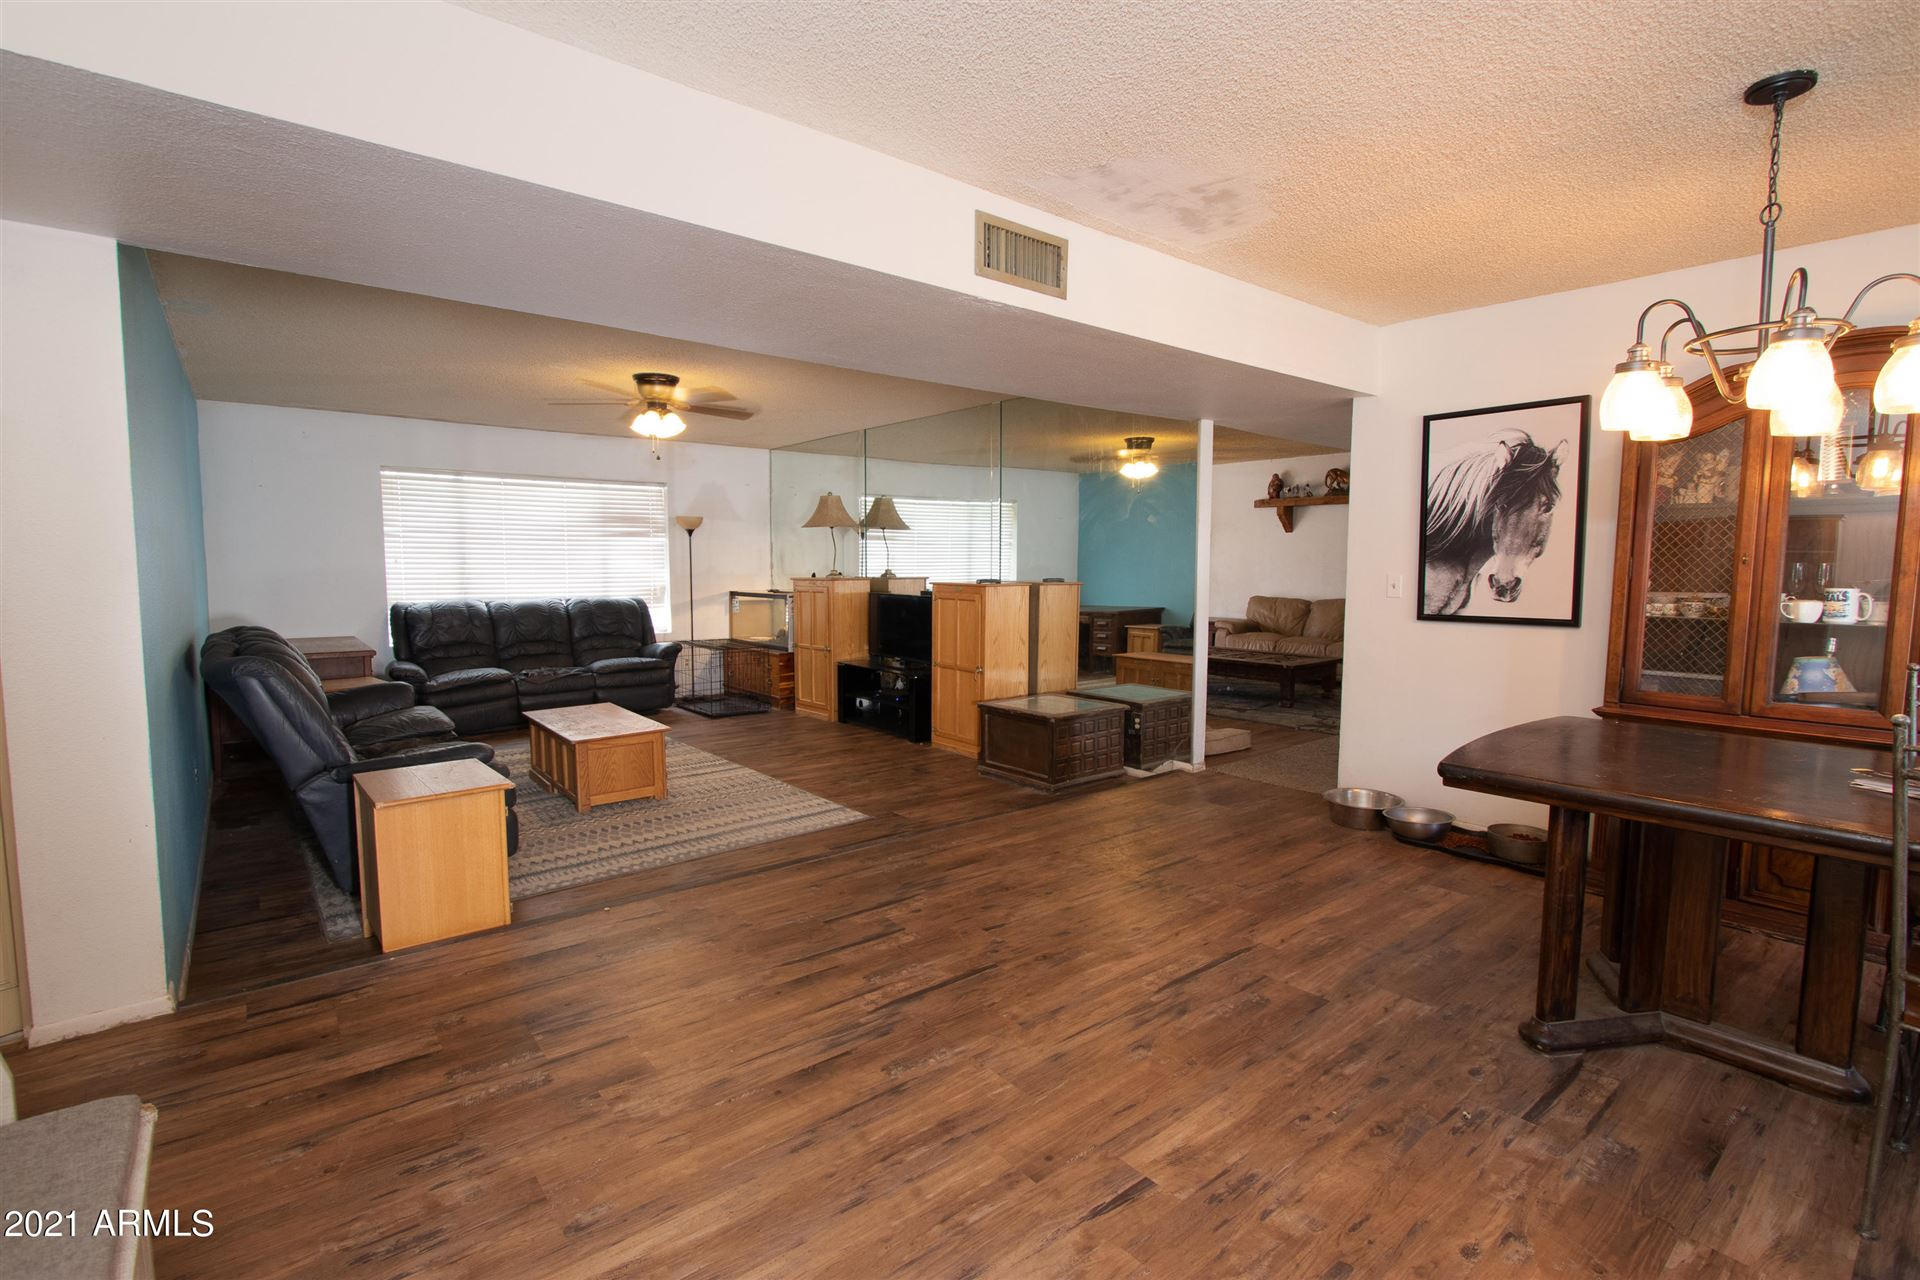 Photo of 5949 W Mary Jane Lane, Glendale, AZ 85306 (MLS # 6229610)